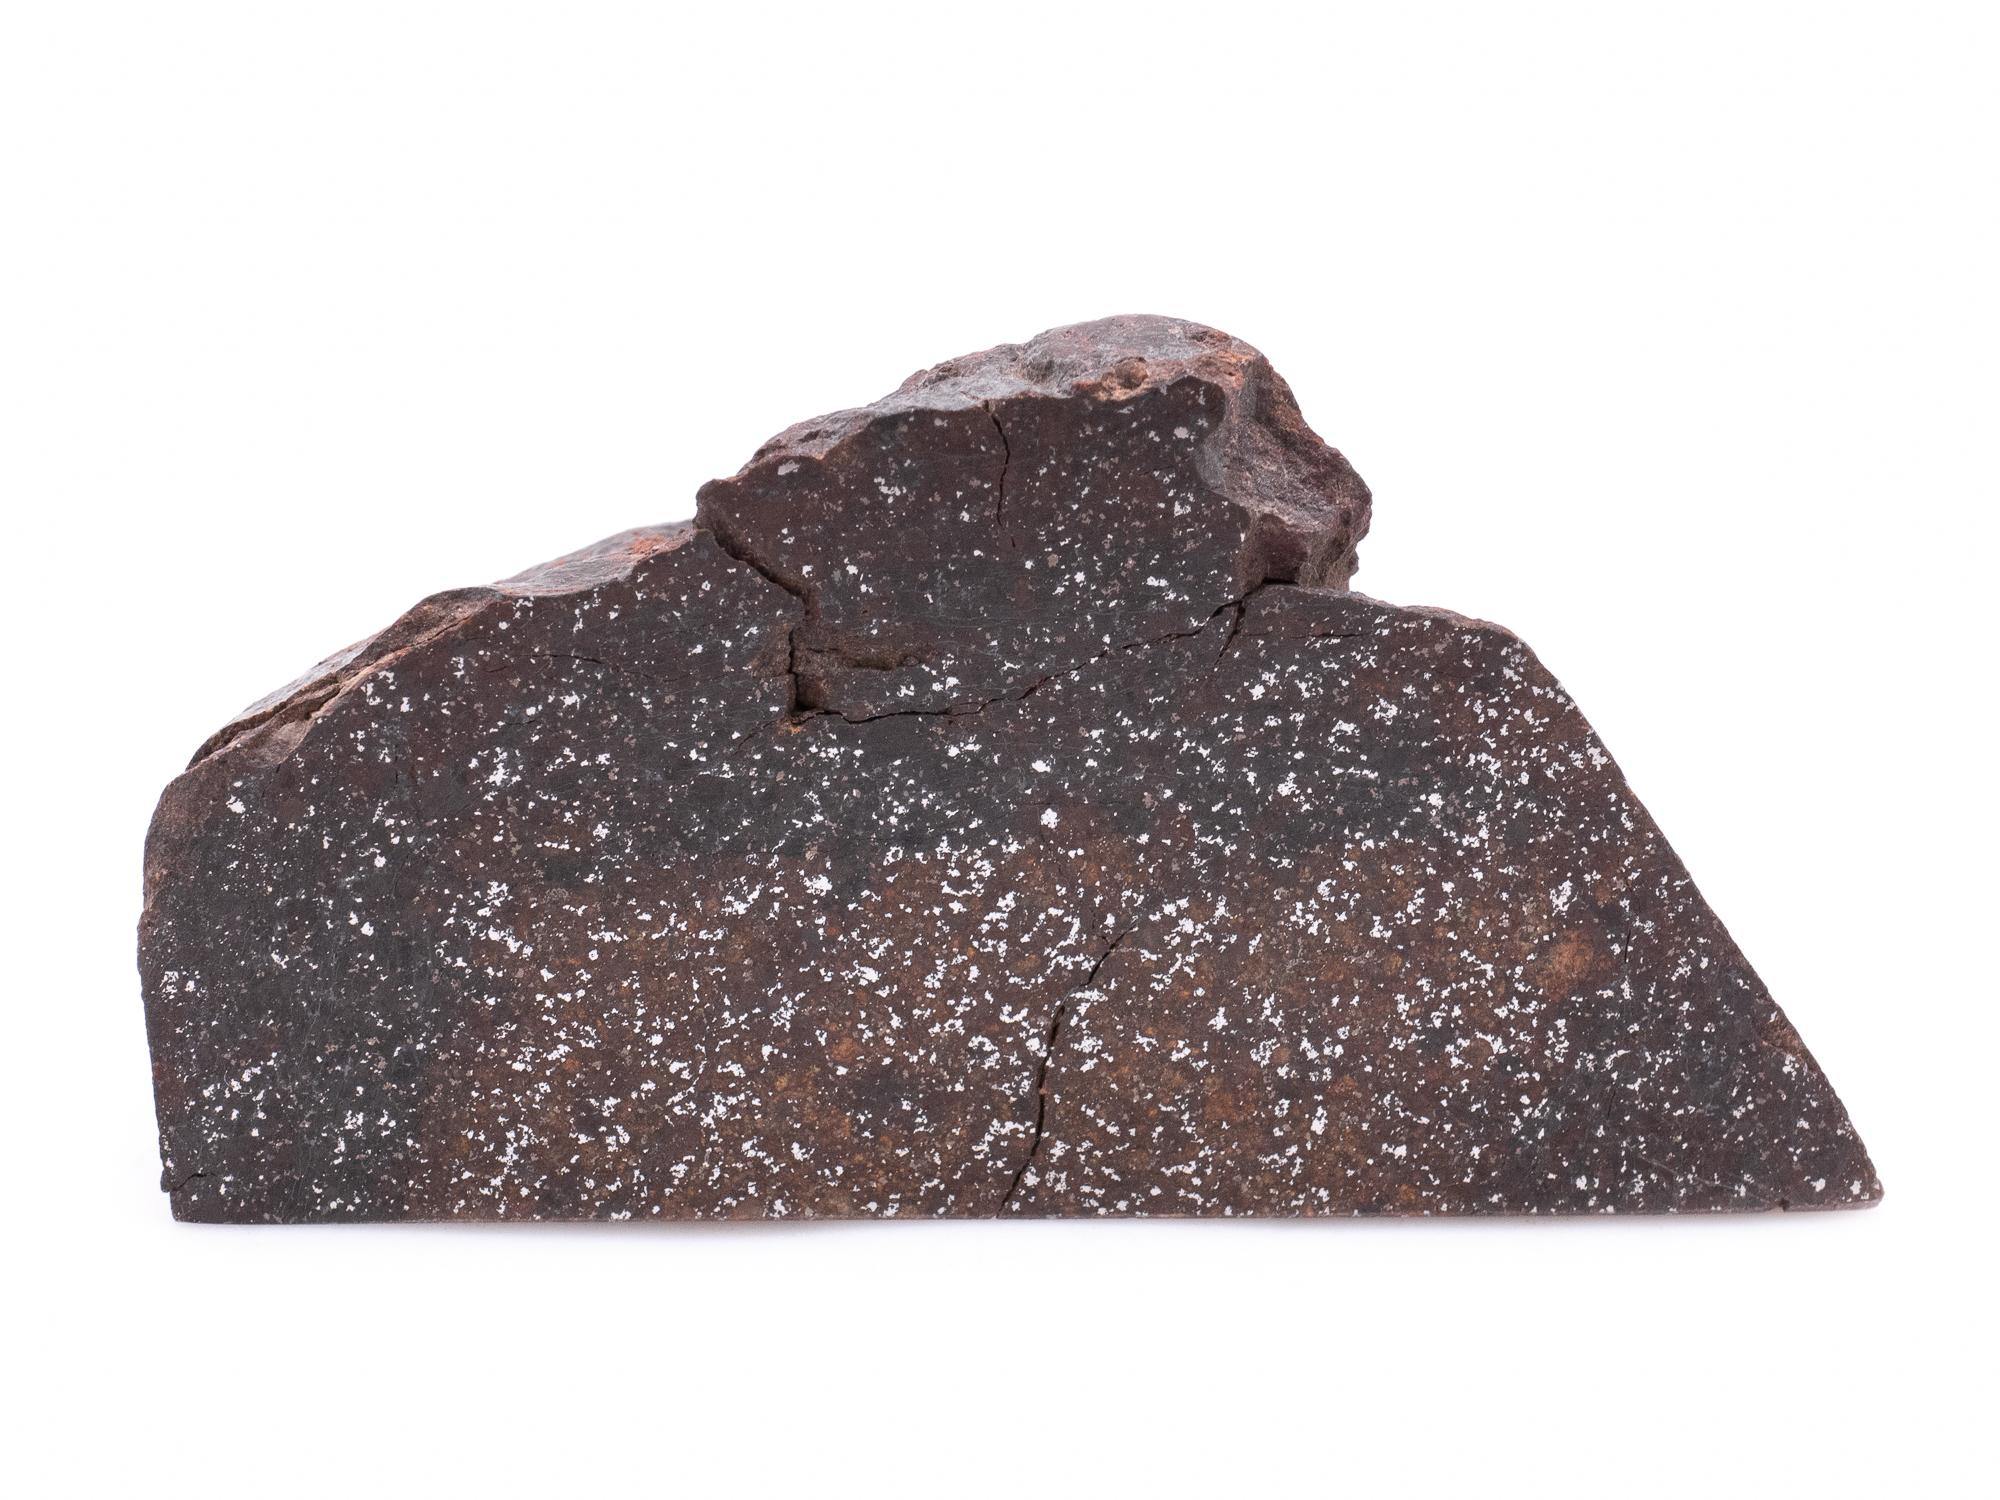 stone meteorite 106